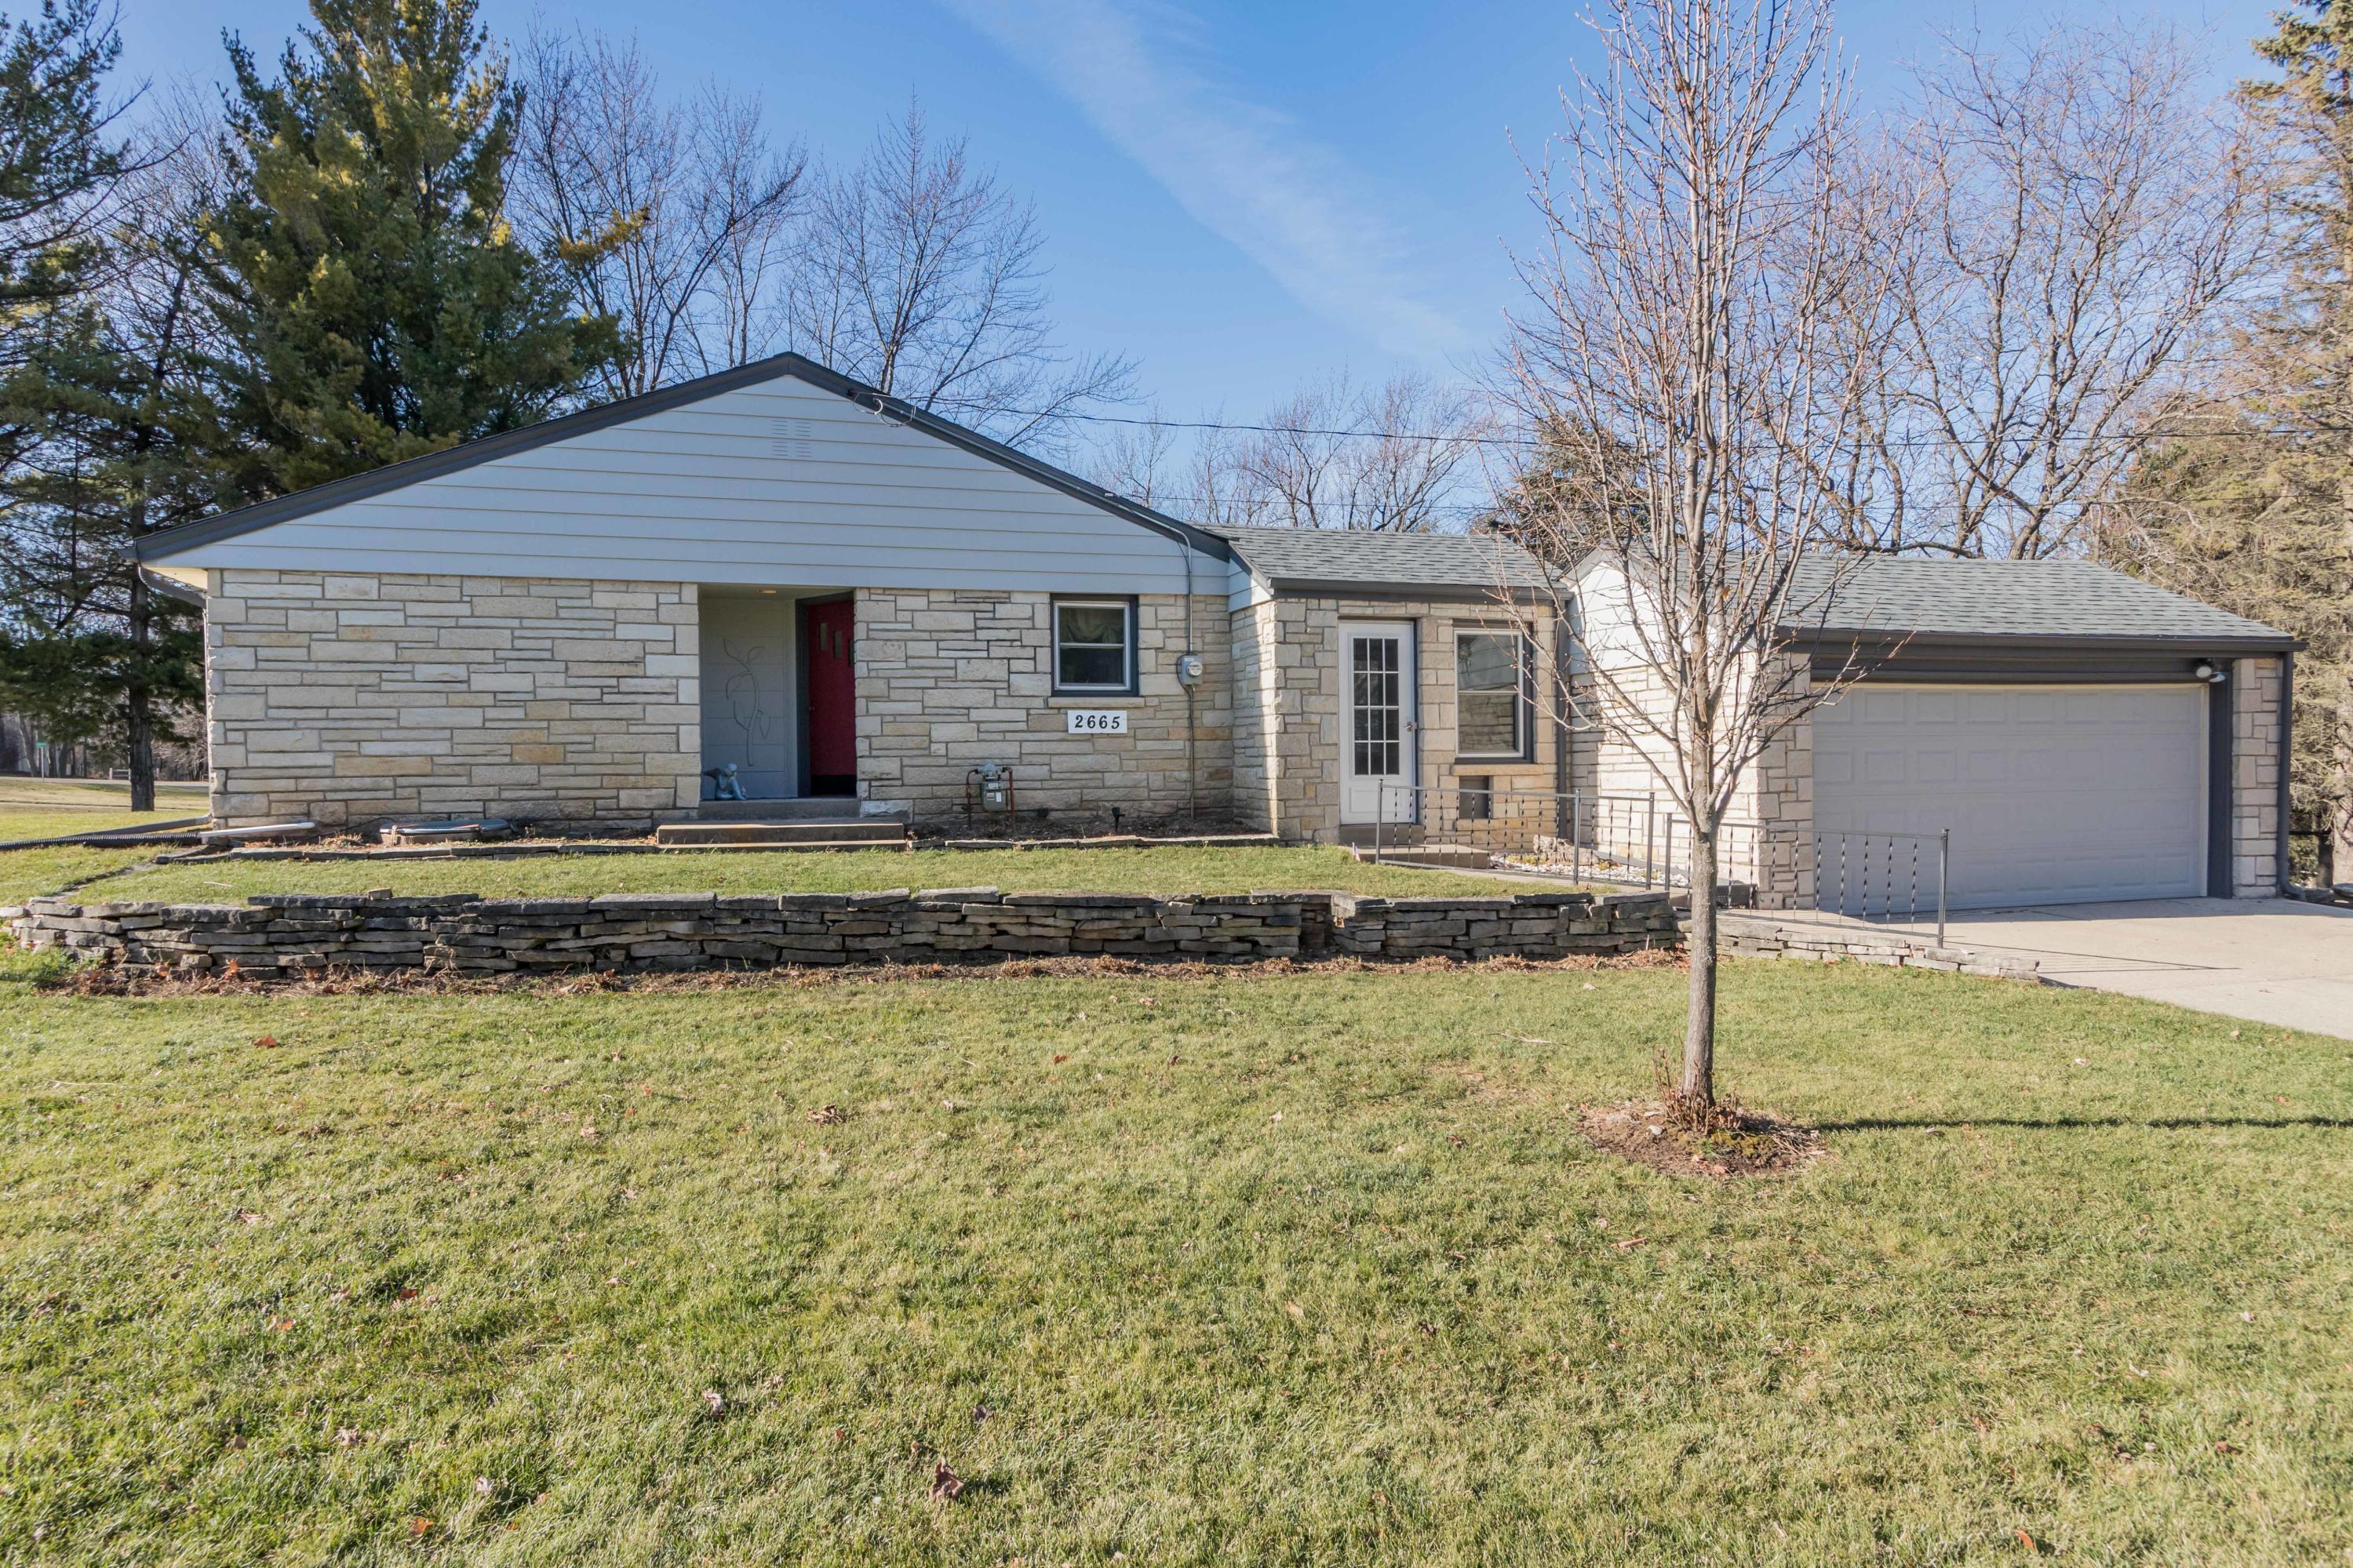 2665 Tyein Pl, Brookfield, Wisconsin 53045, 2 Bedrooms Bedrooms, 4 Rooms Rooms,1 BathroomBathrooms,Single-Family,For Sale,Tyein Pl,1720654